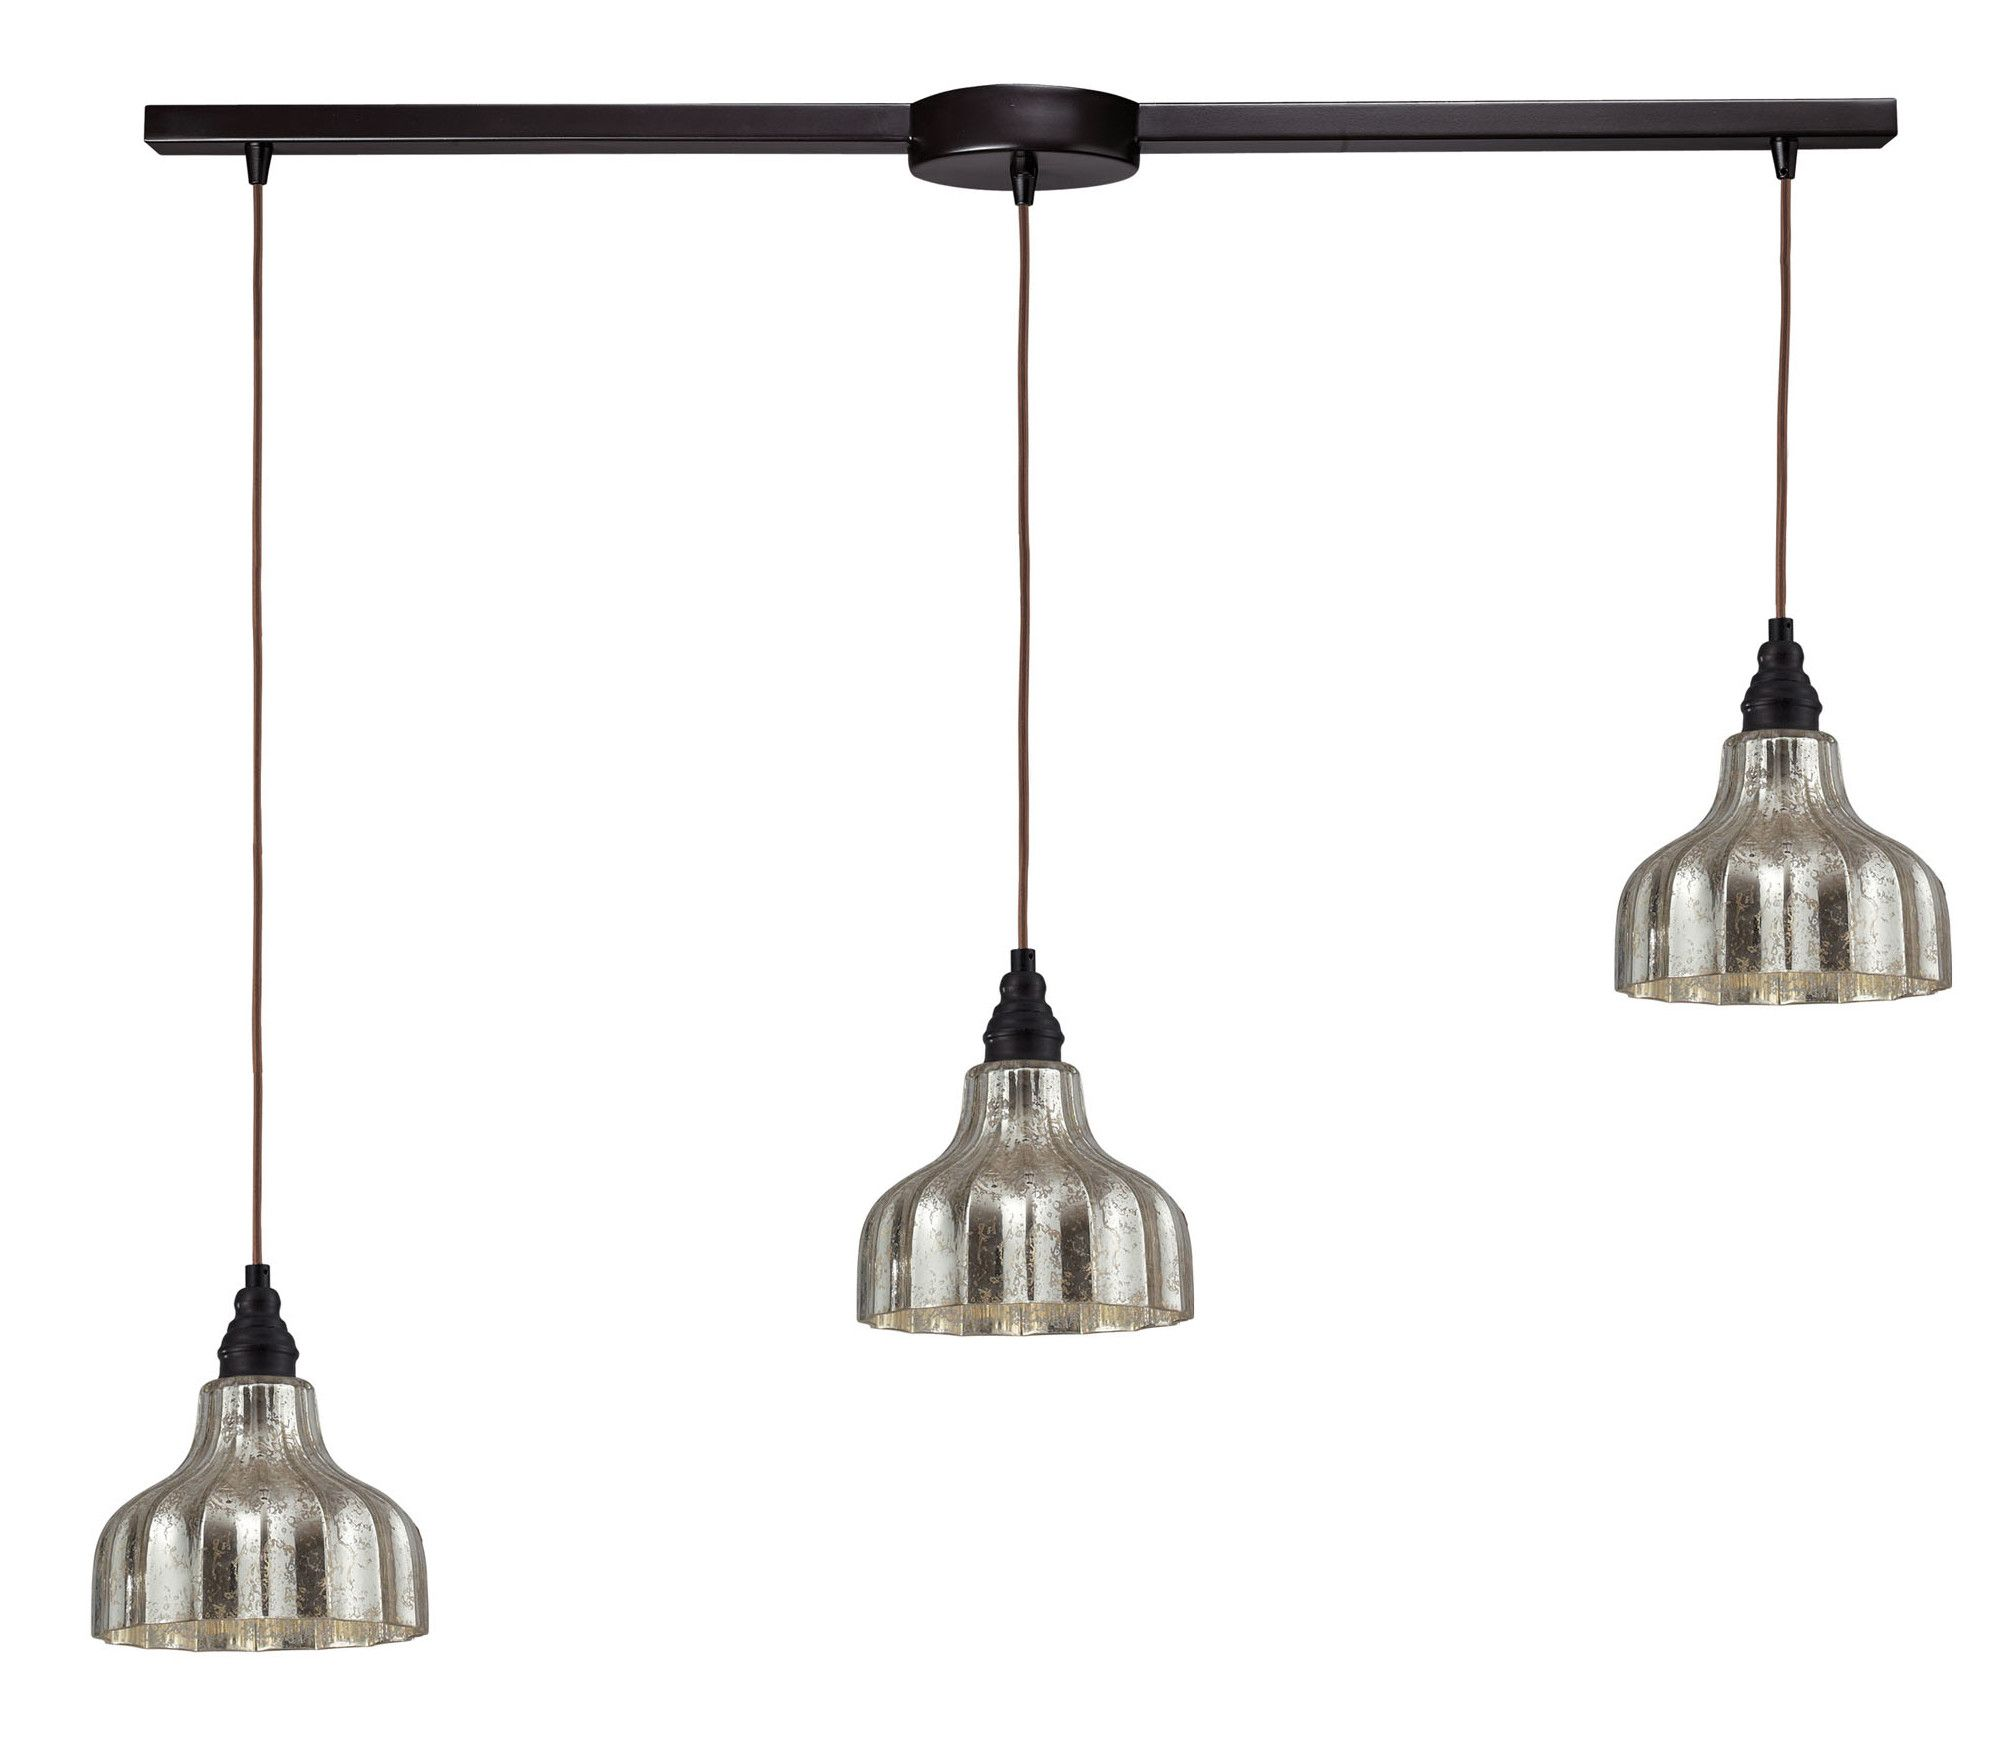 3 Light Pendant Island Kitchen Lighting Orofino 3 Light Kitchen Island Pendant Pendants Change 3 And